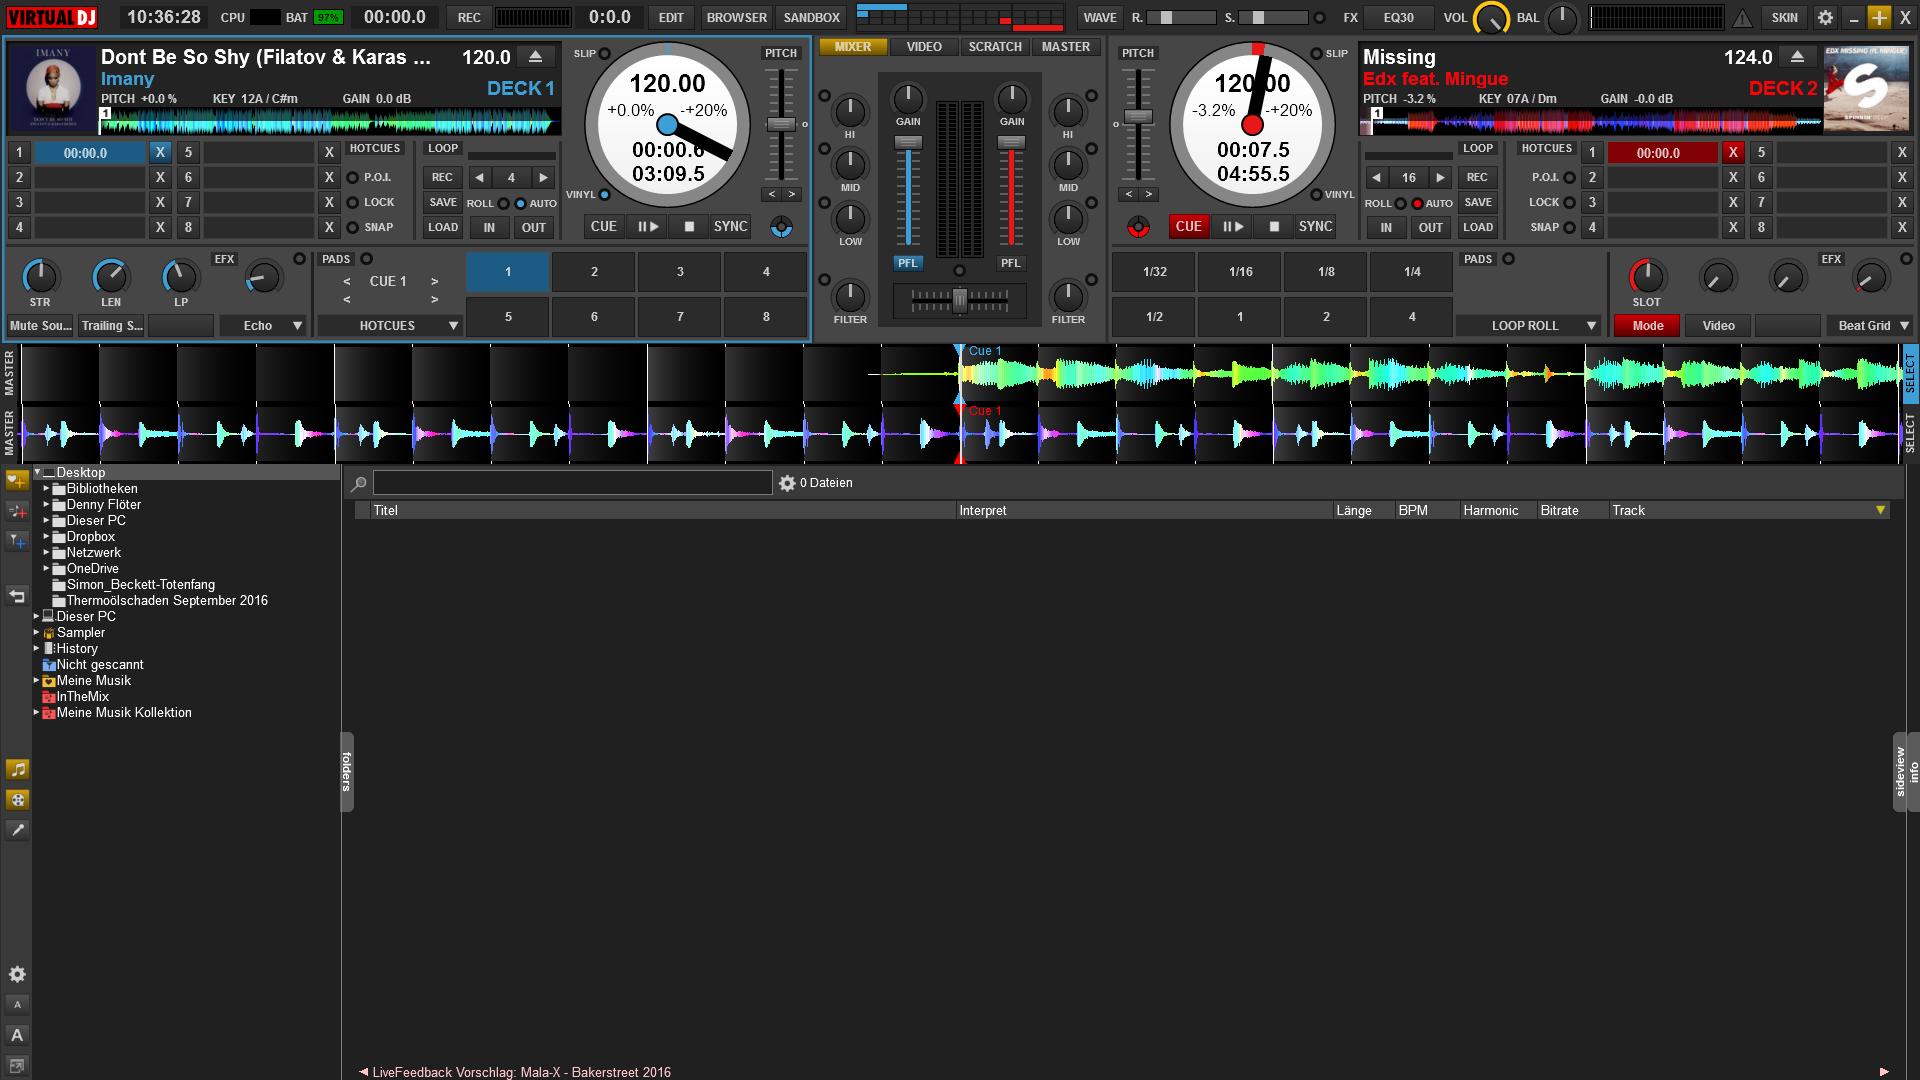 virtual dj 8 karaoke skin